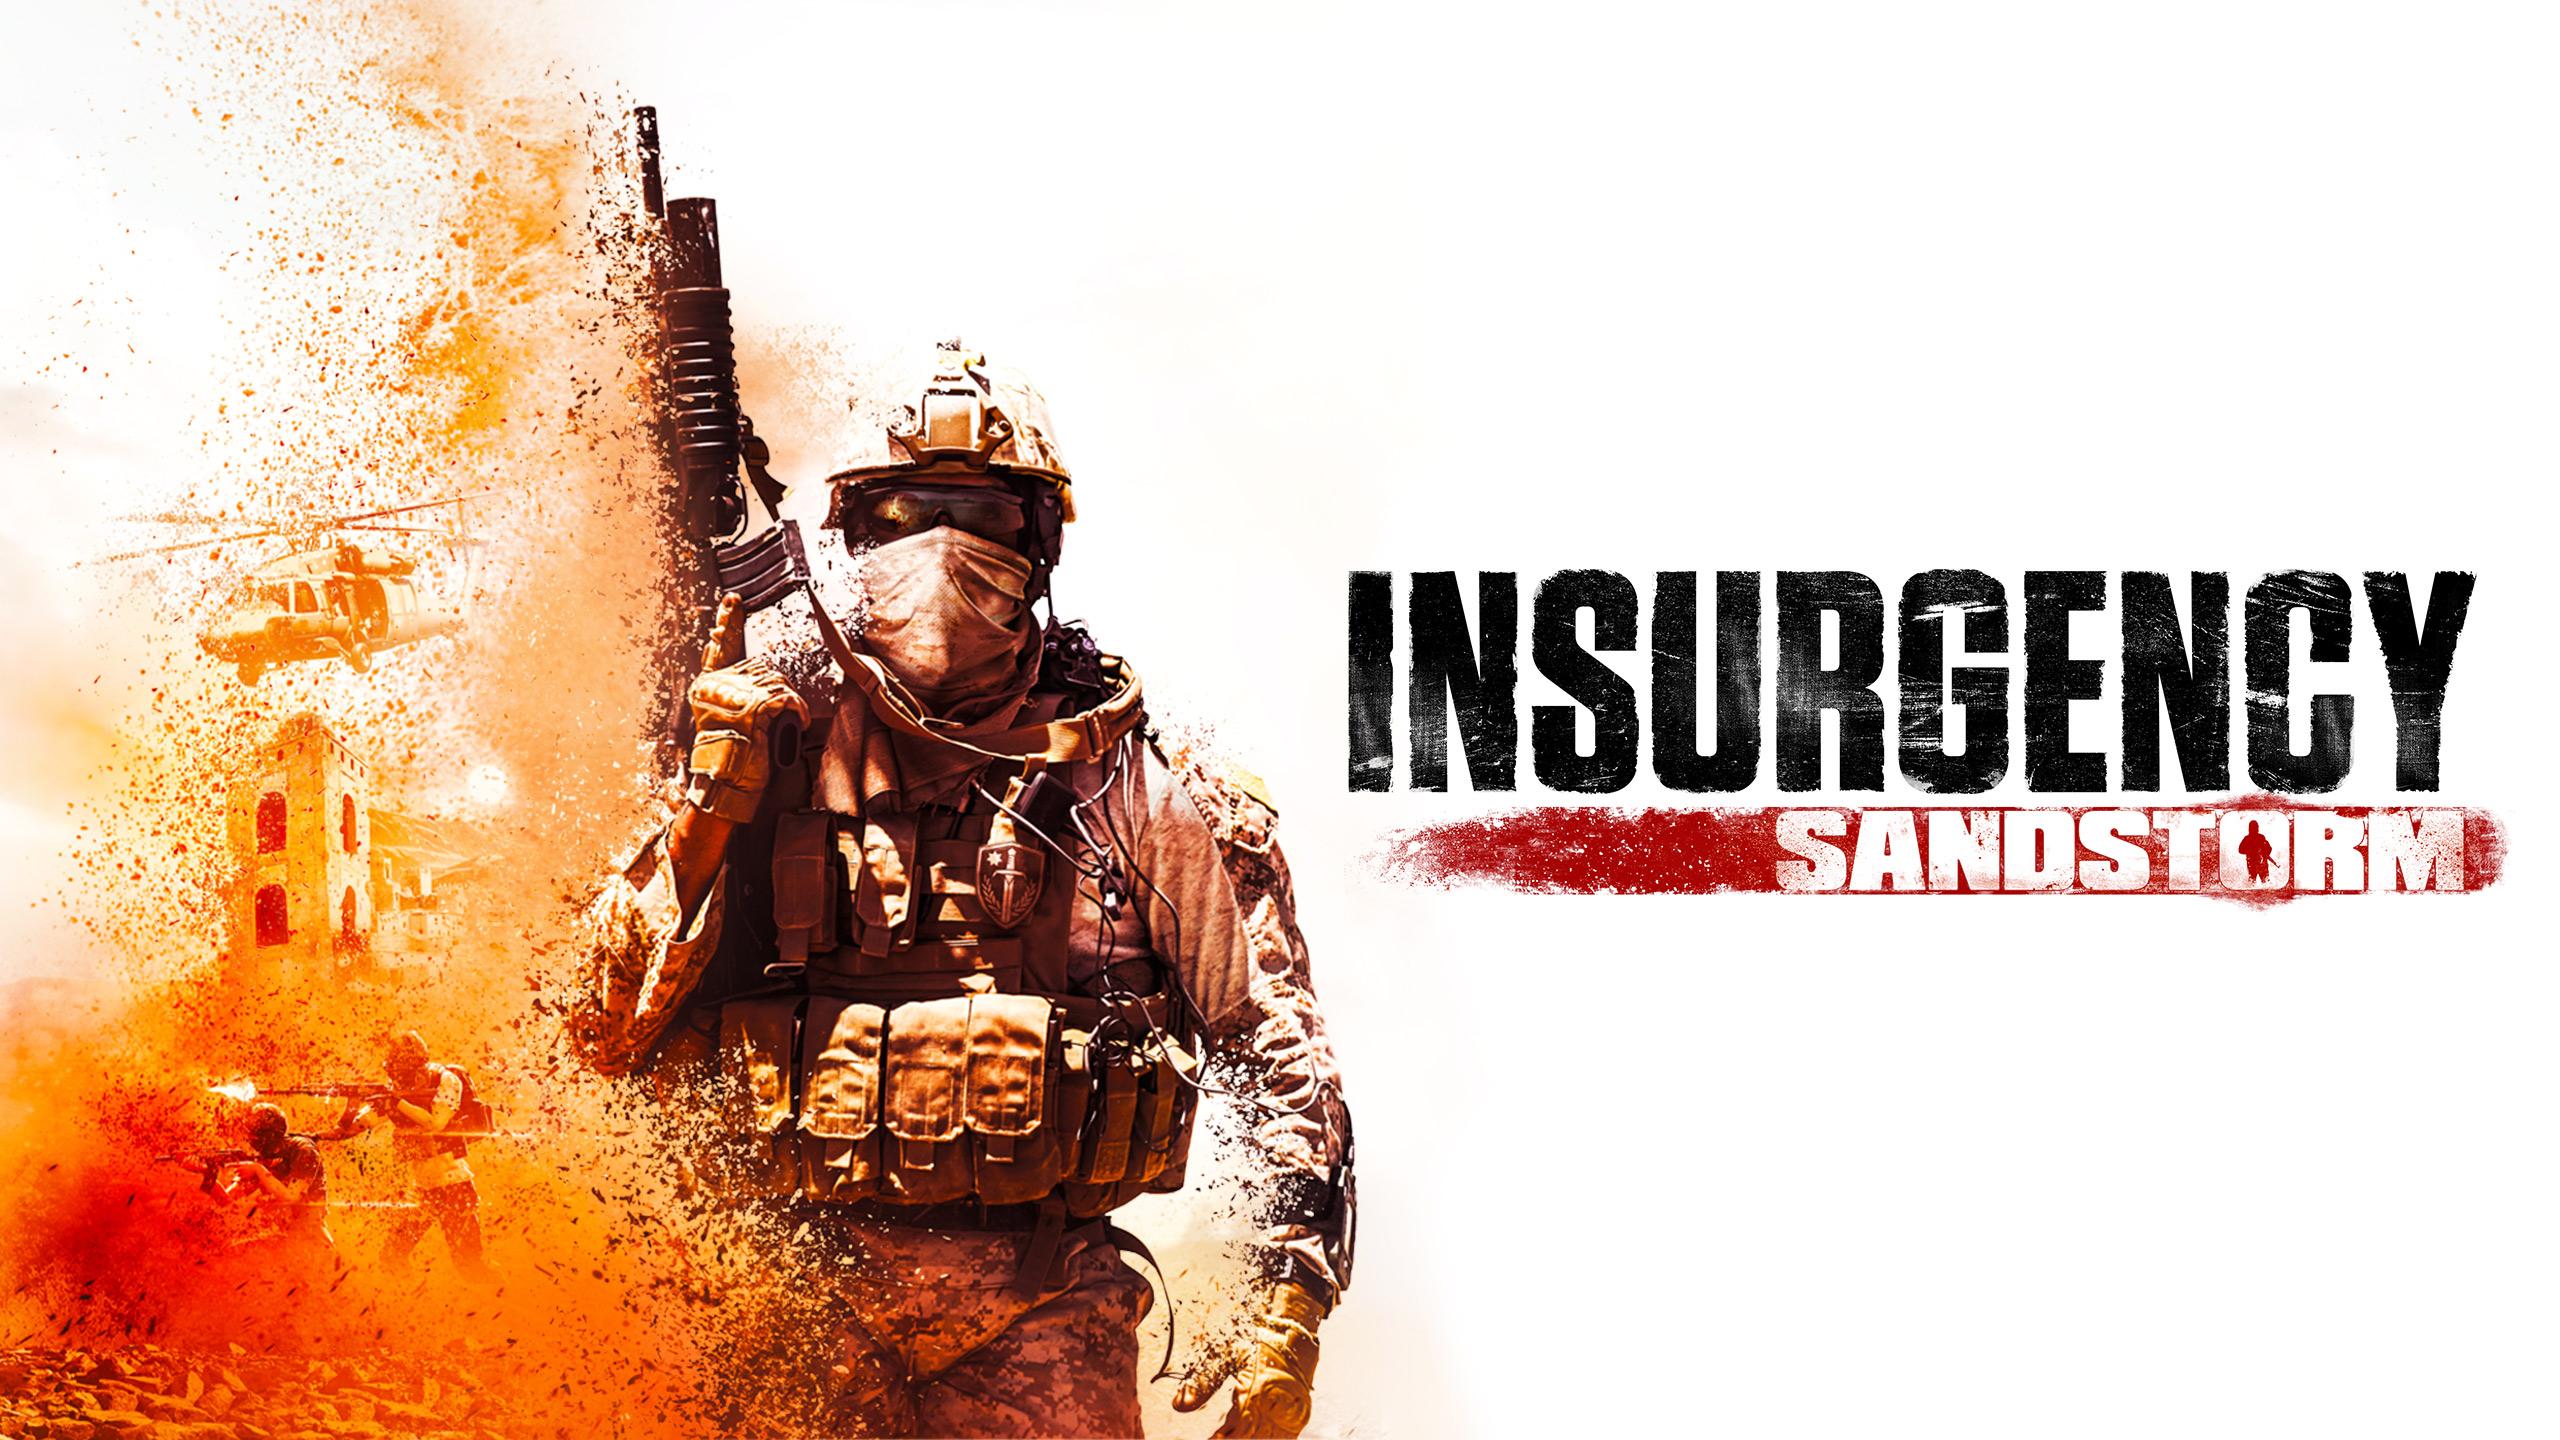 Insurgency: Sandstorm in arrivo - Epic Games Store